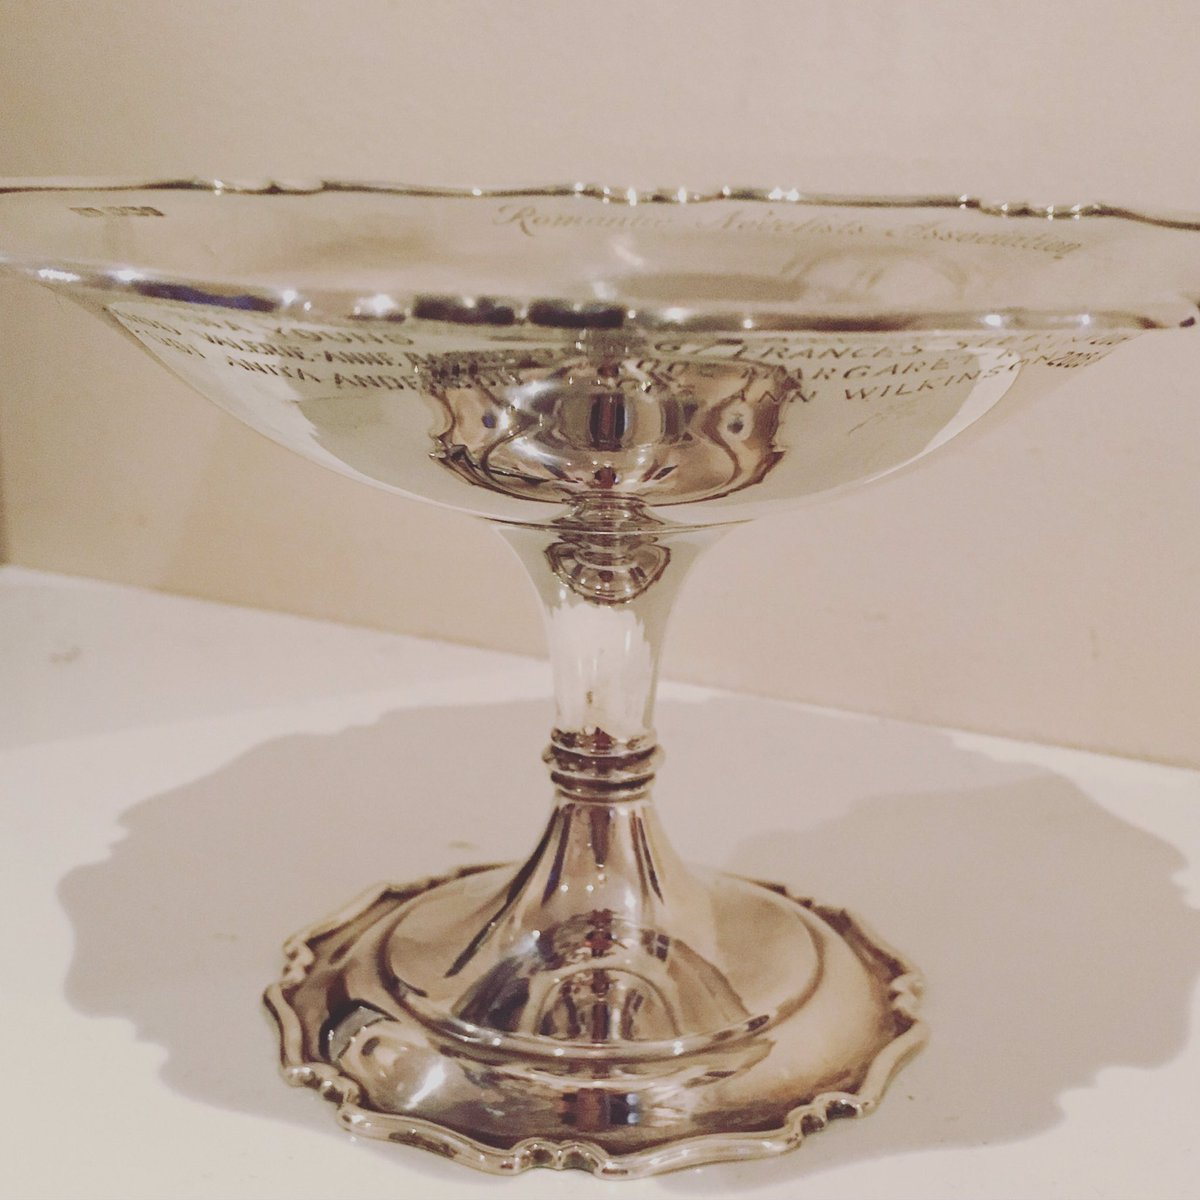 The Joan Hessayon trophy all shiny and ready for its new home tomorrow @RNAtweets #RNASummerParty #JoanHessayon https://t.co/cAO93RaQnx